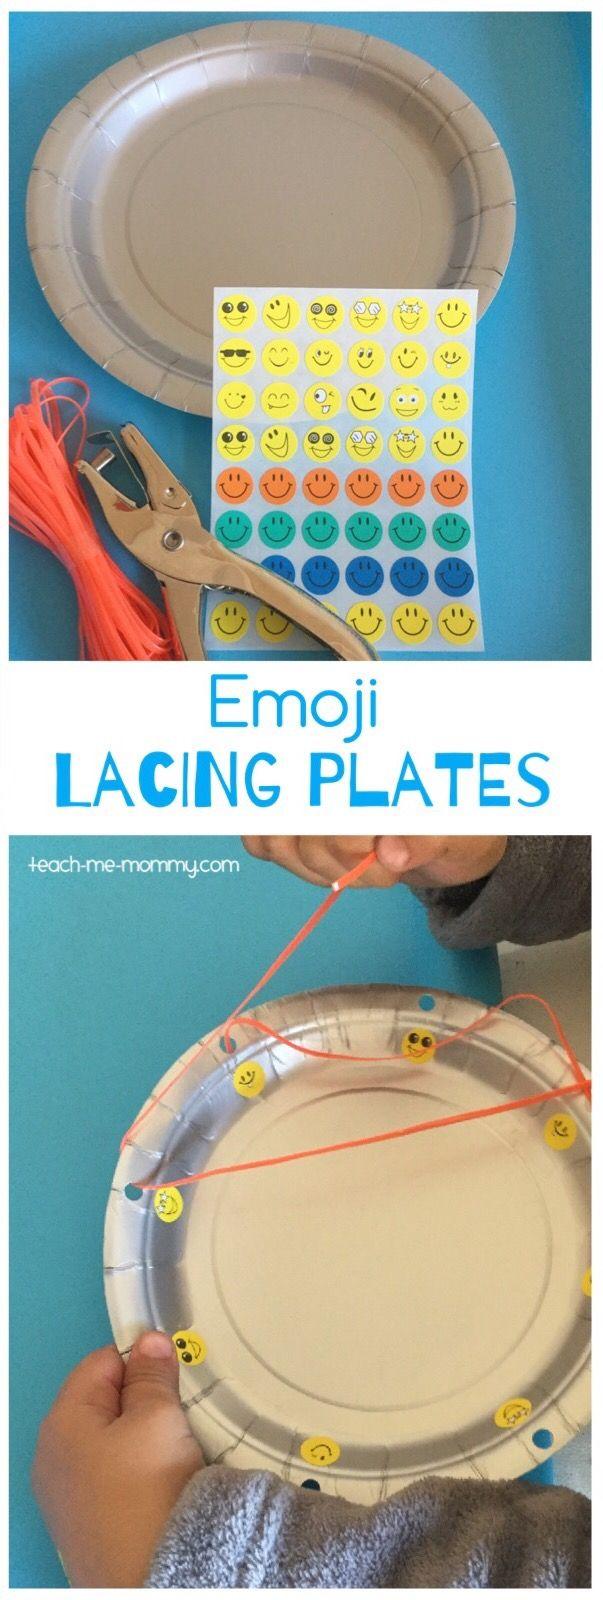 Emoji Lacing Plates Easy to make emoji lacing plates, great for preschoolers' fine motor skills and visual discrimination skills!